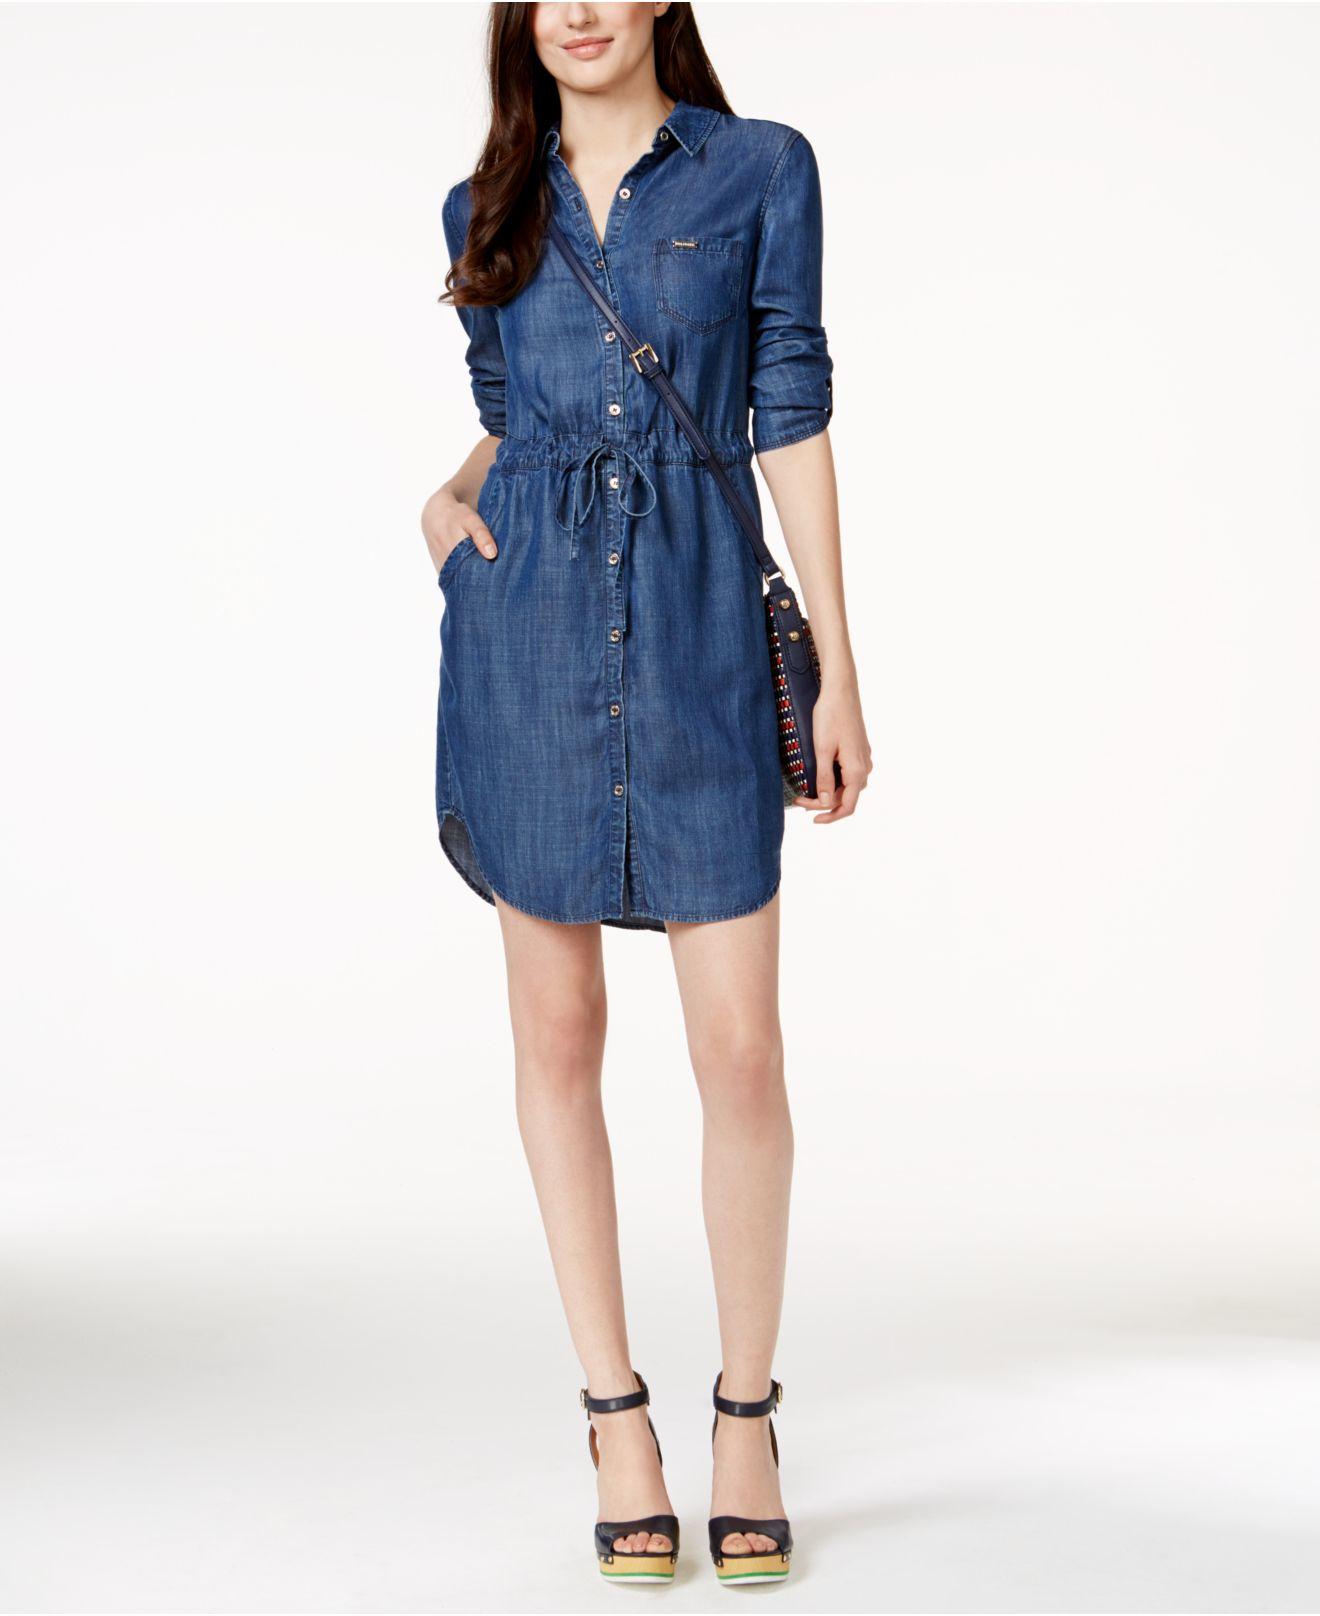 e9421968d74f2e Lyst - Tommy Hilfiger Belted Denim Shirtdress in Blue